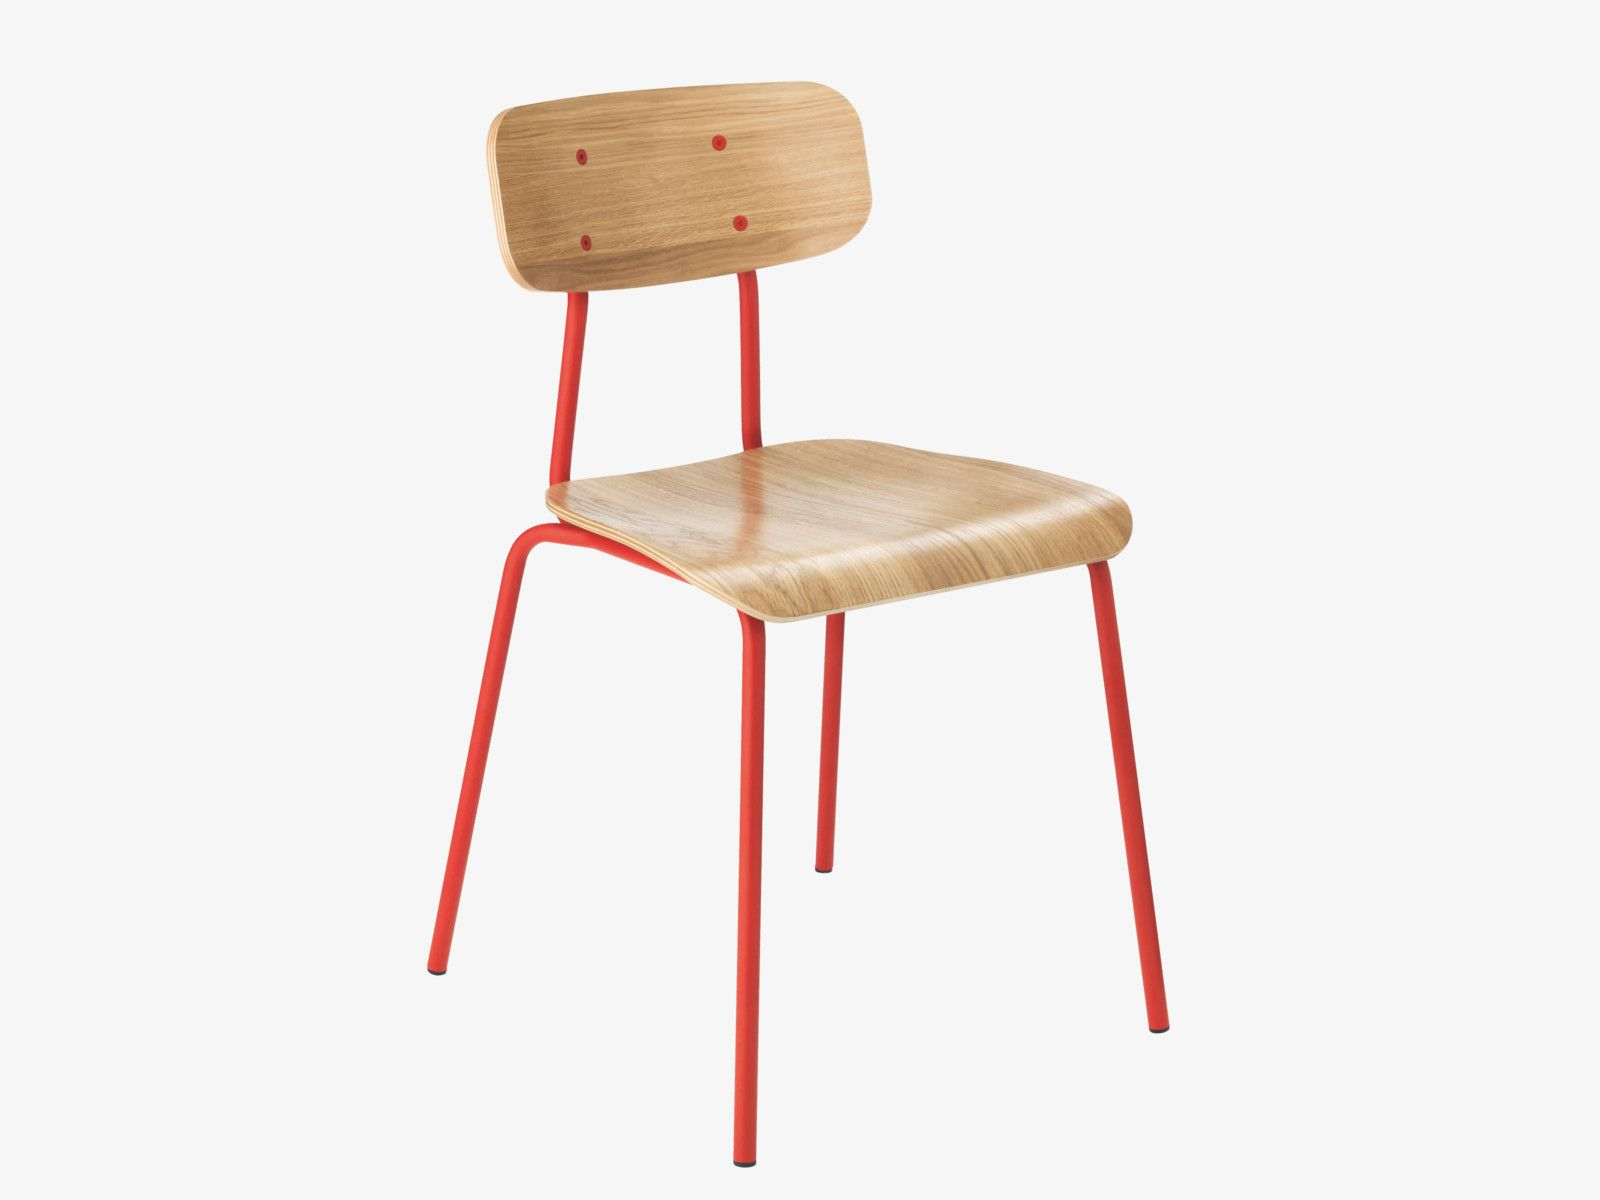 HESTER Rouge Chaise Chaises Habitat VL • 0911